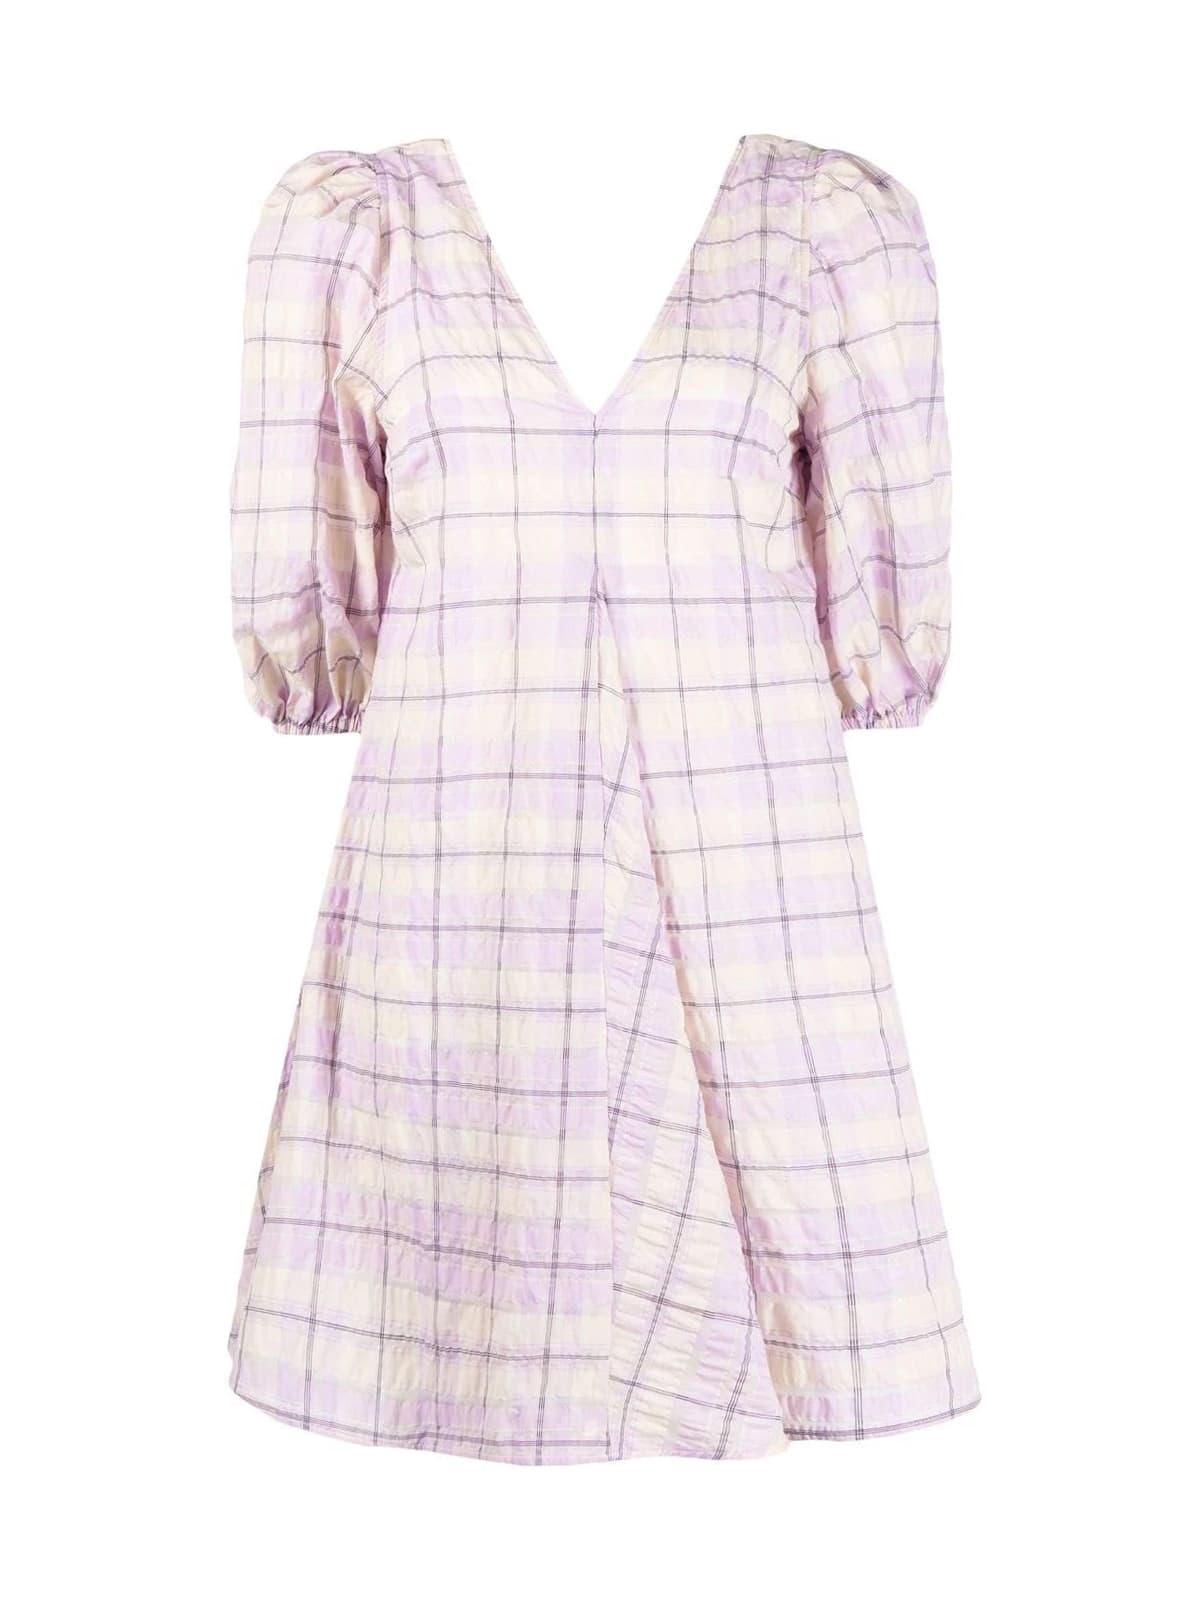 Ganni Seersucker Check Short Dress